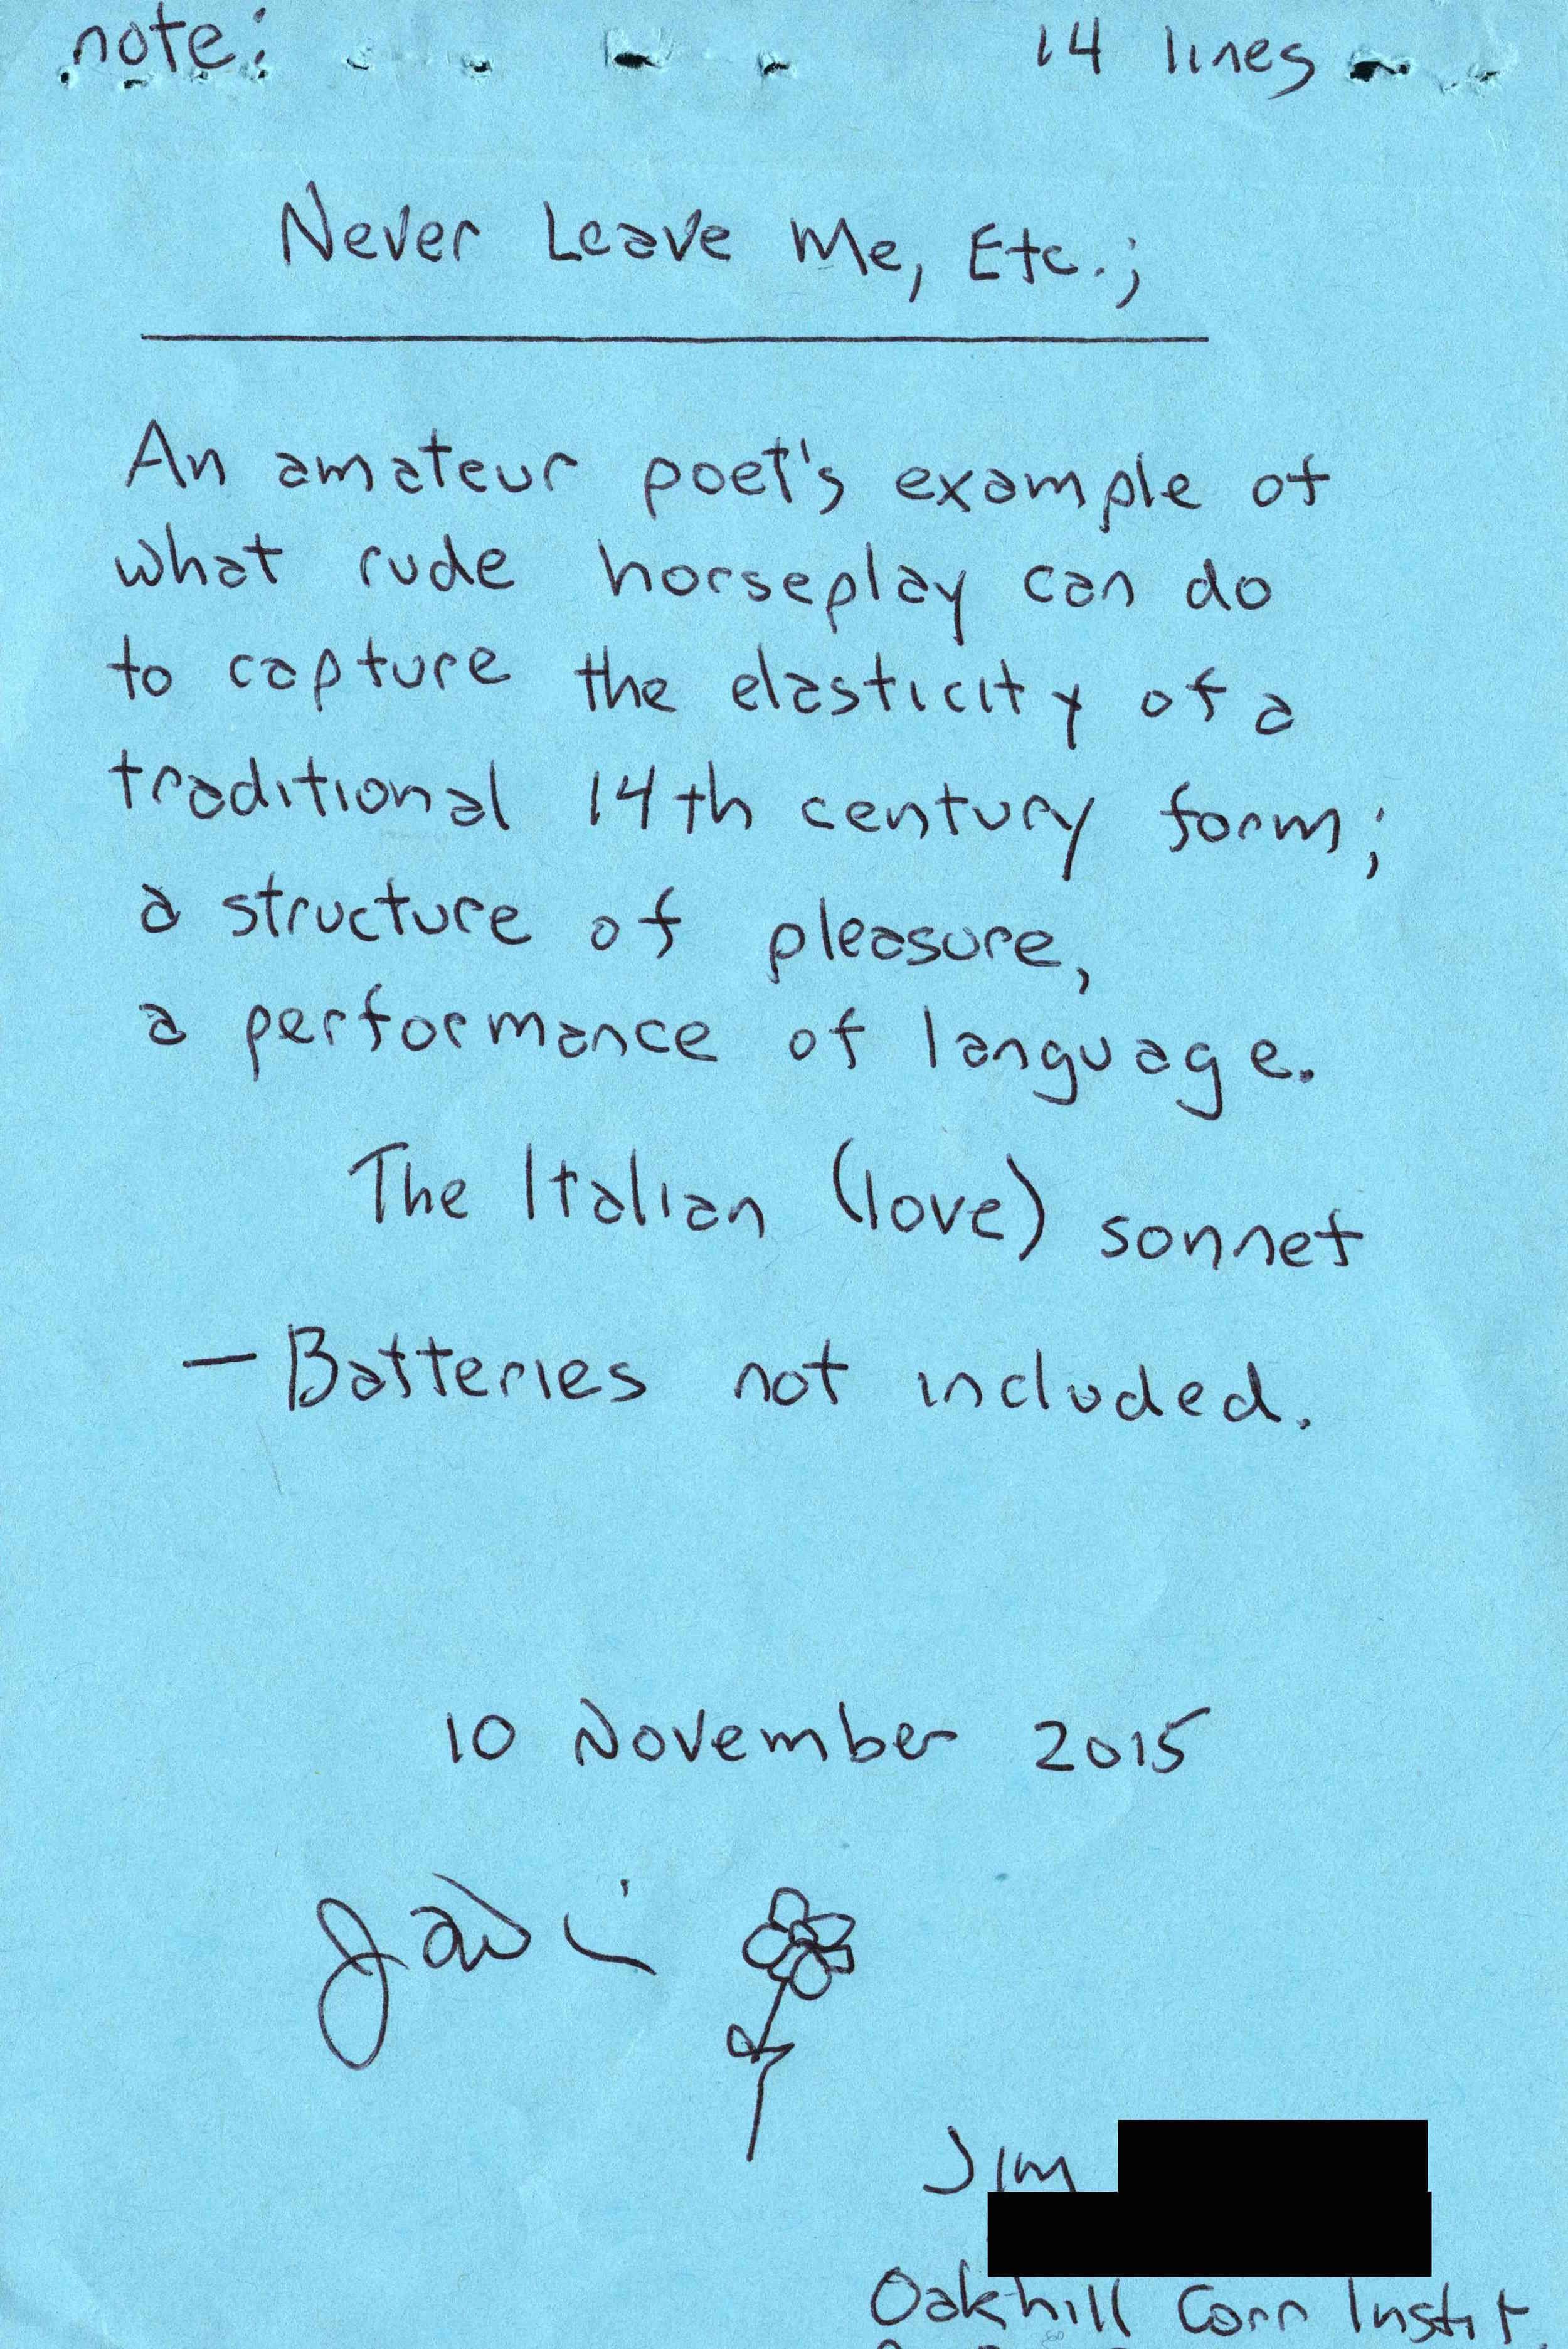 Jim G Wee - Artist Statement (Never Leave Me, Etc._).jpg